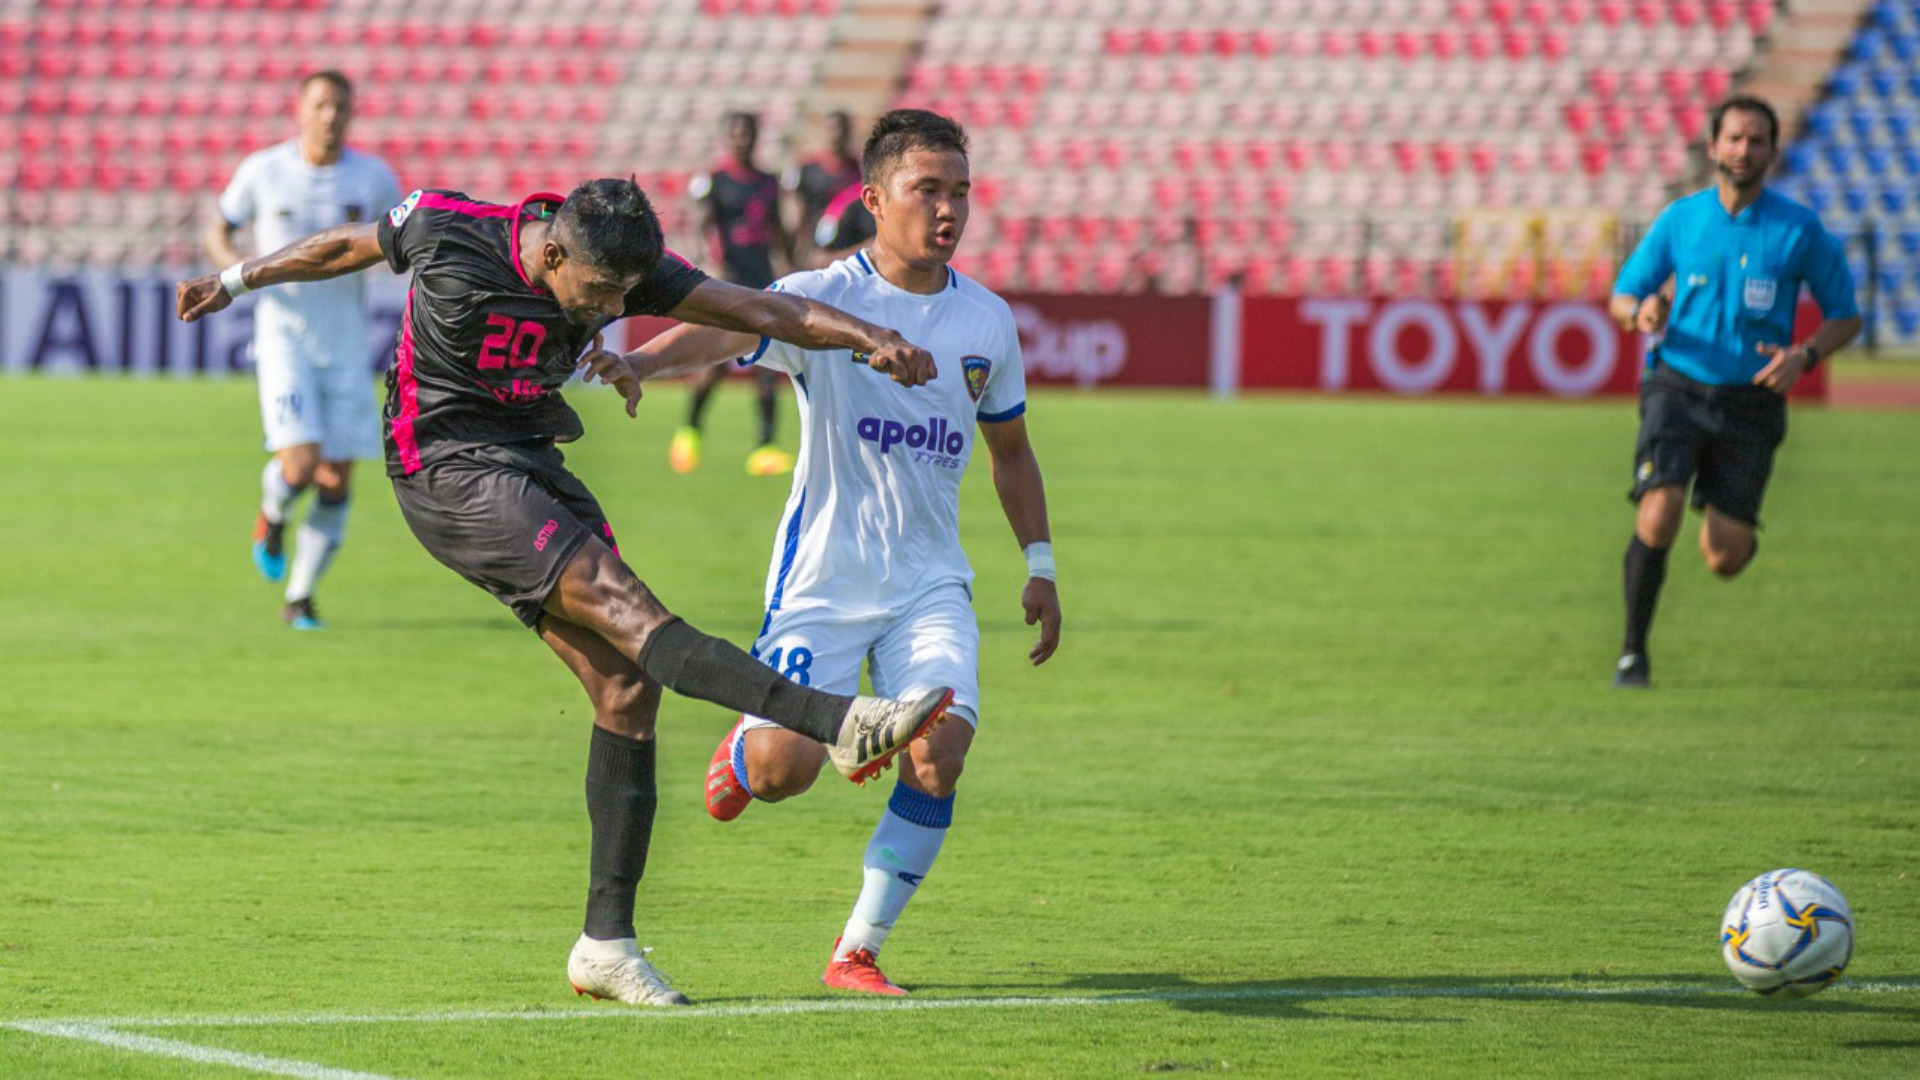 Minerva Punjab Chennaiyin FC AFC Cup 2019